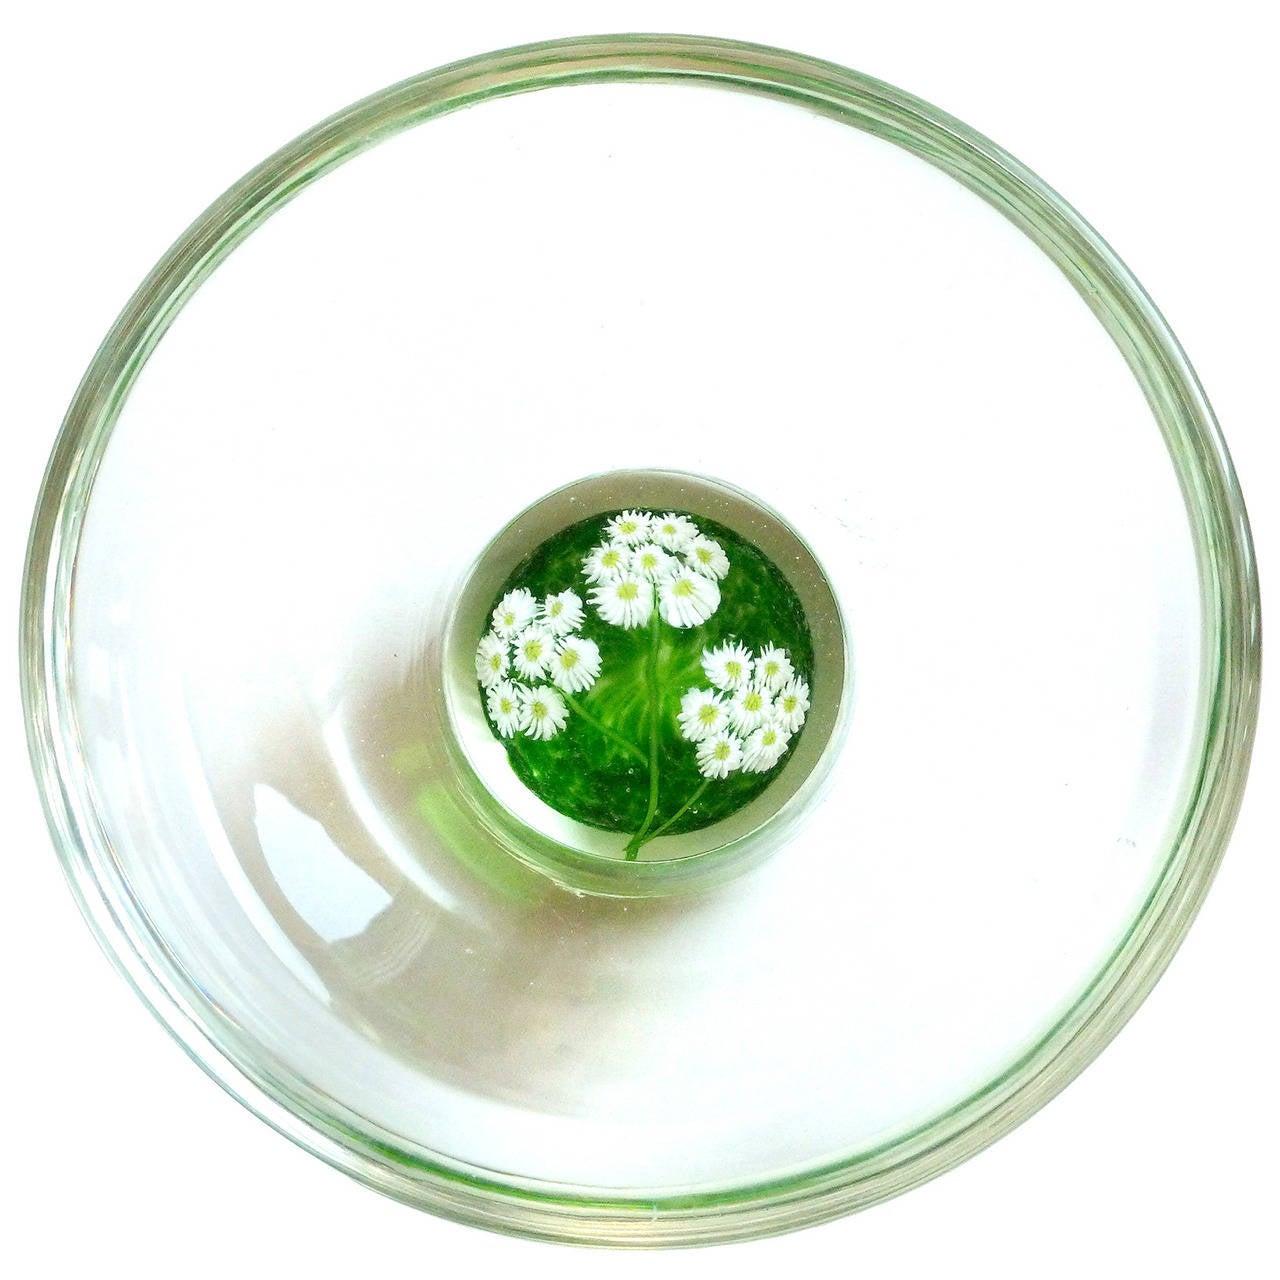 Fratelli toso murano millefiori wild flowers italian art glass fratelli toso murano millefiori wild flowers italian art glass paperweight bowl for sale mightylinksfo